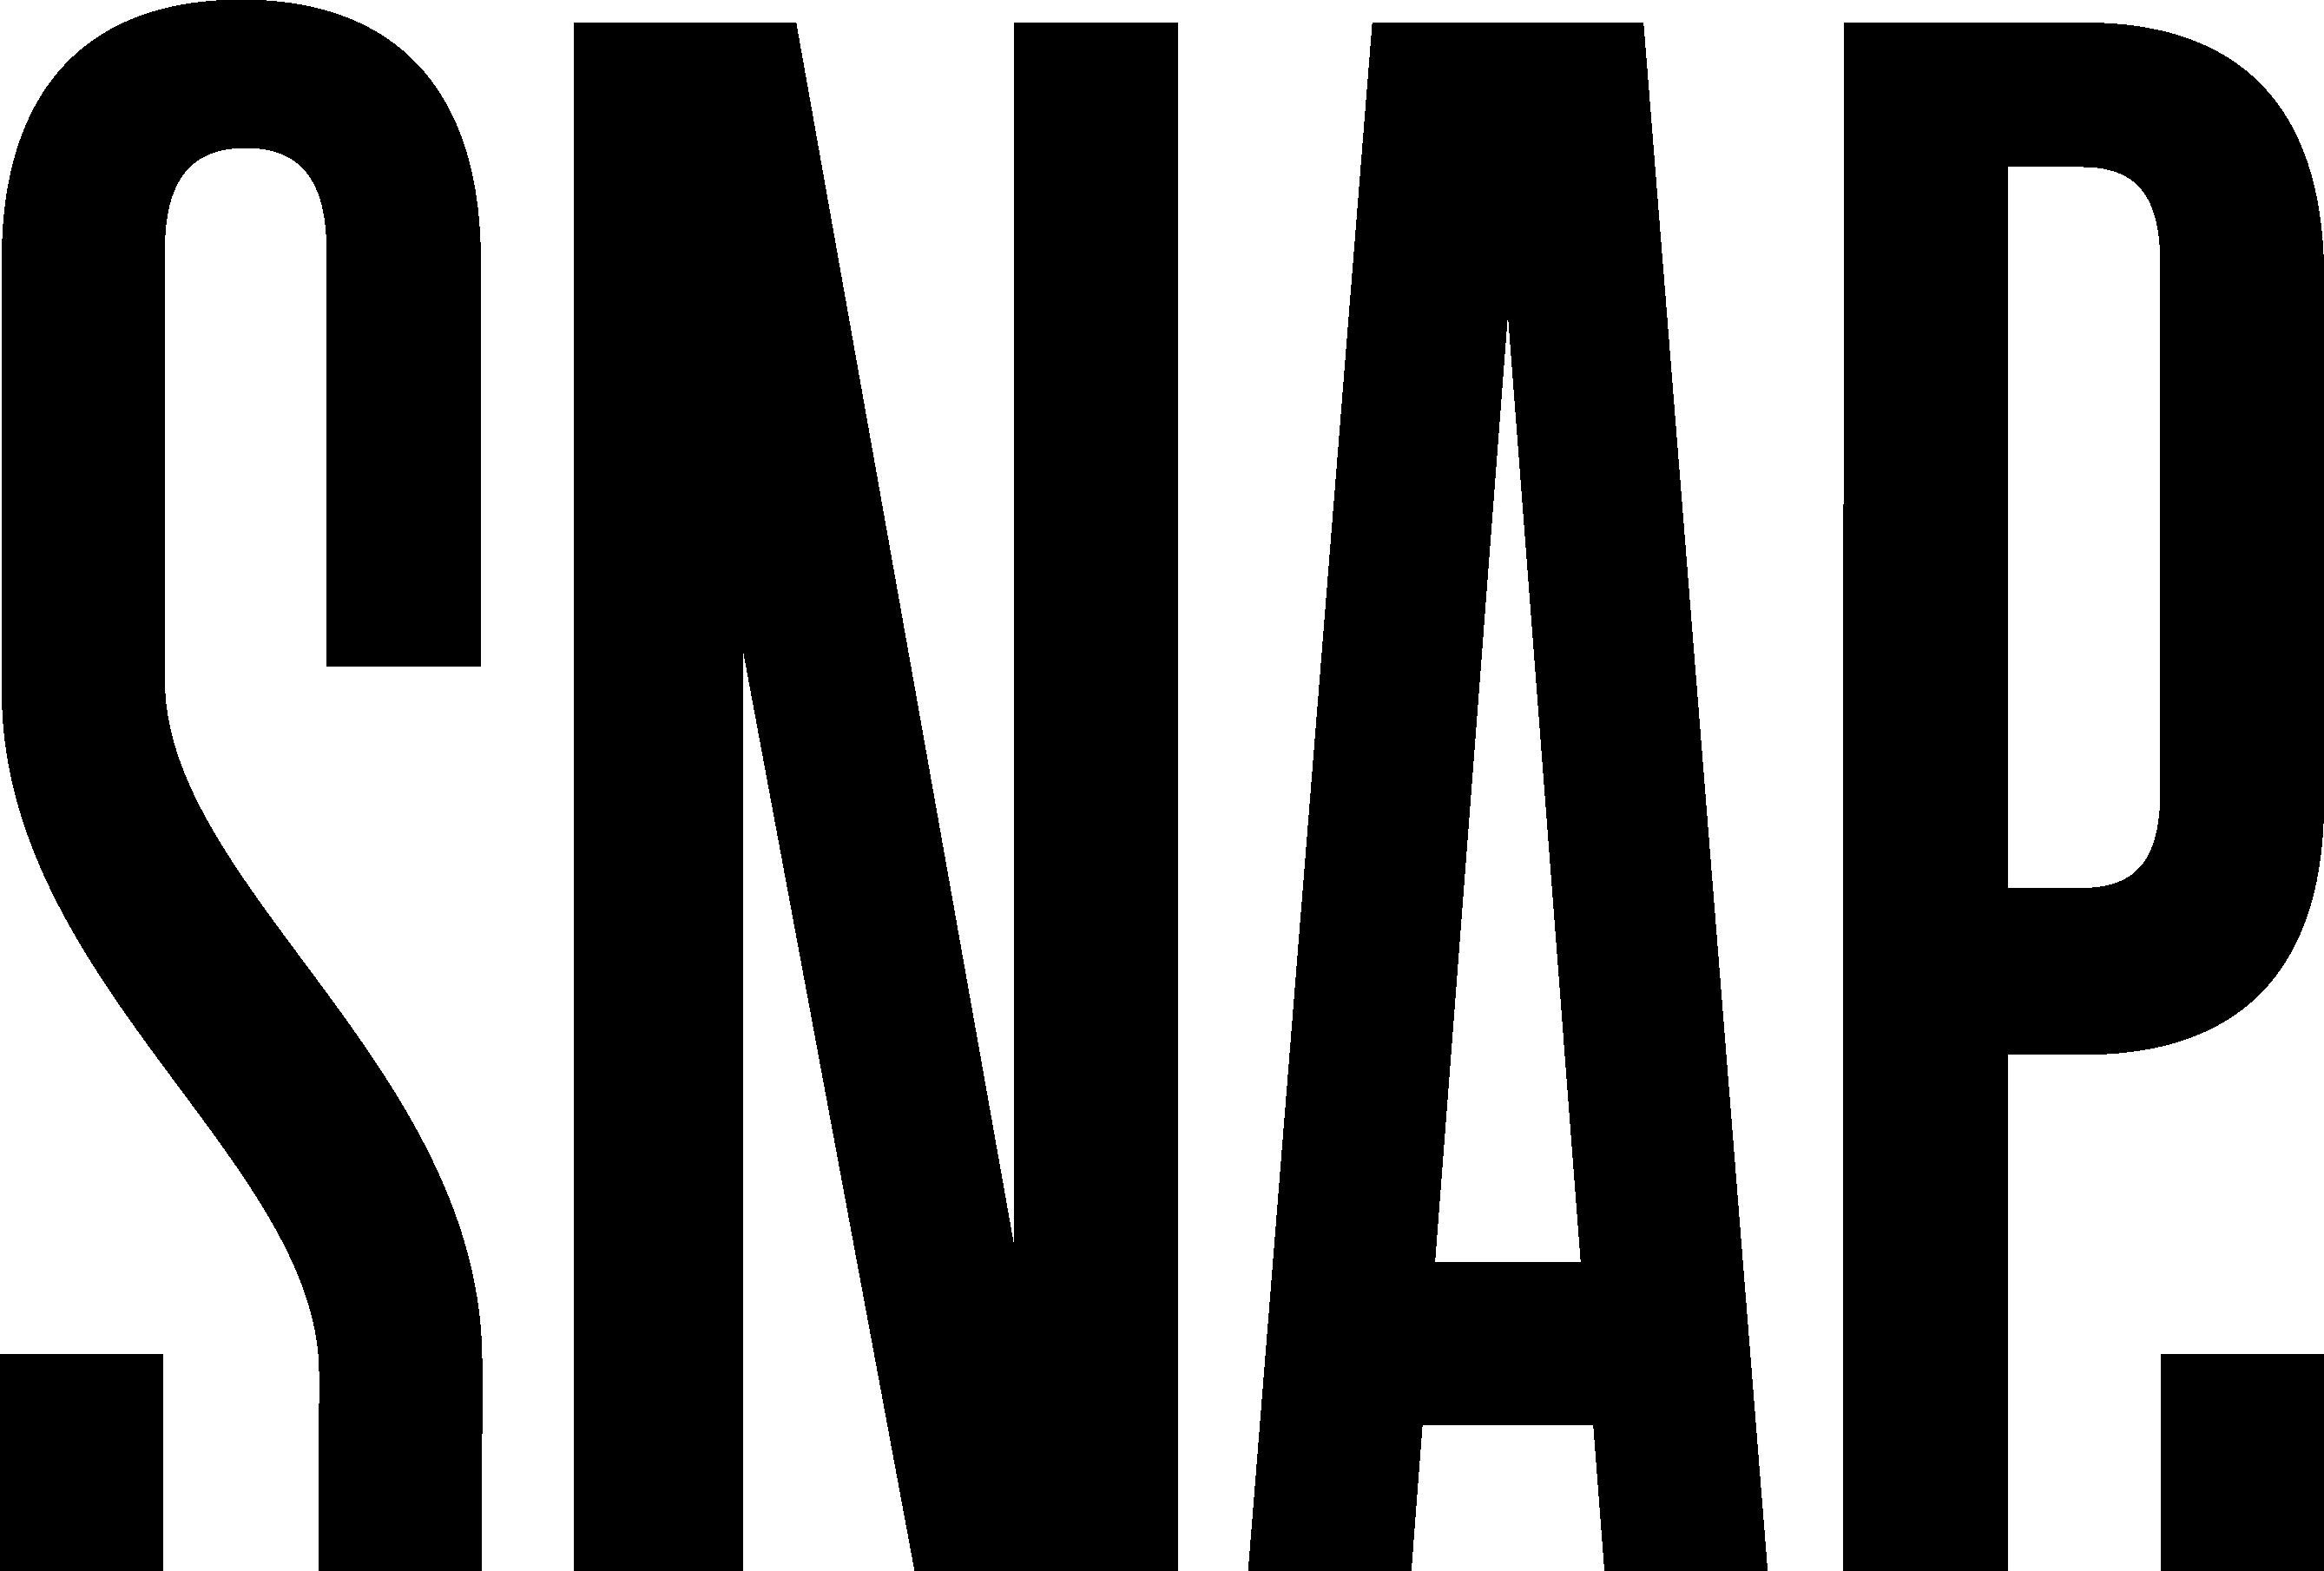 logo_snap-noir.png